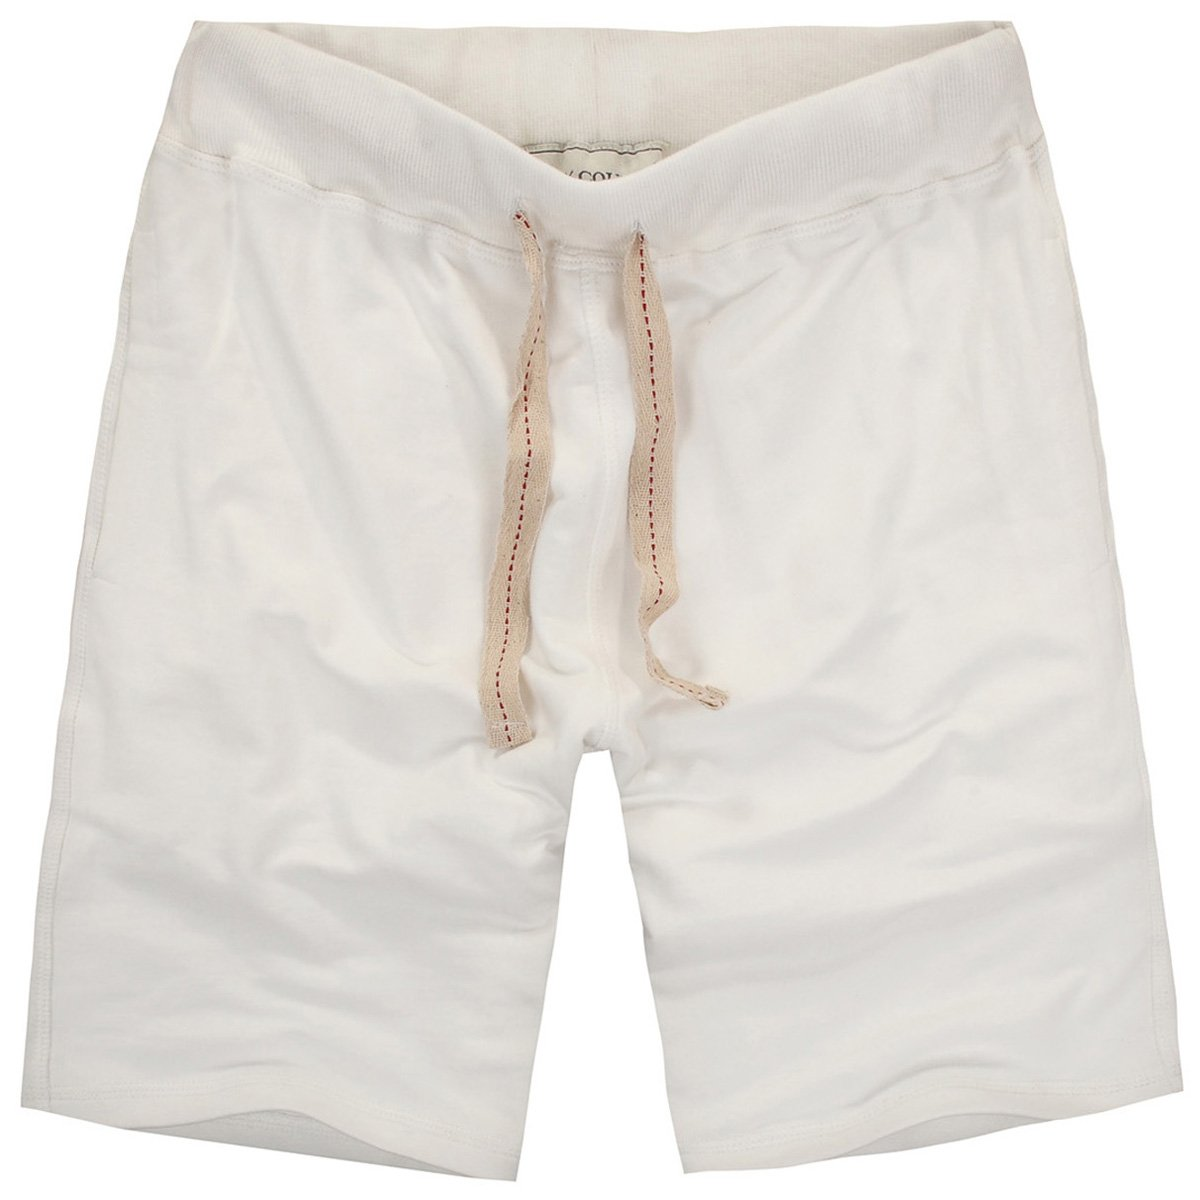 Amy Coulee Men's Casual Classic Cotton Gym Short (L, Beige)